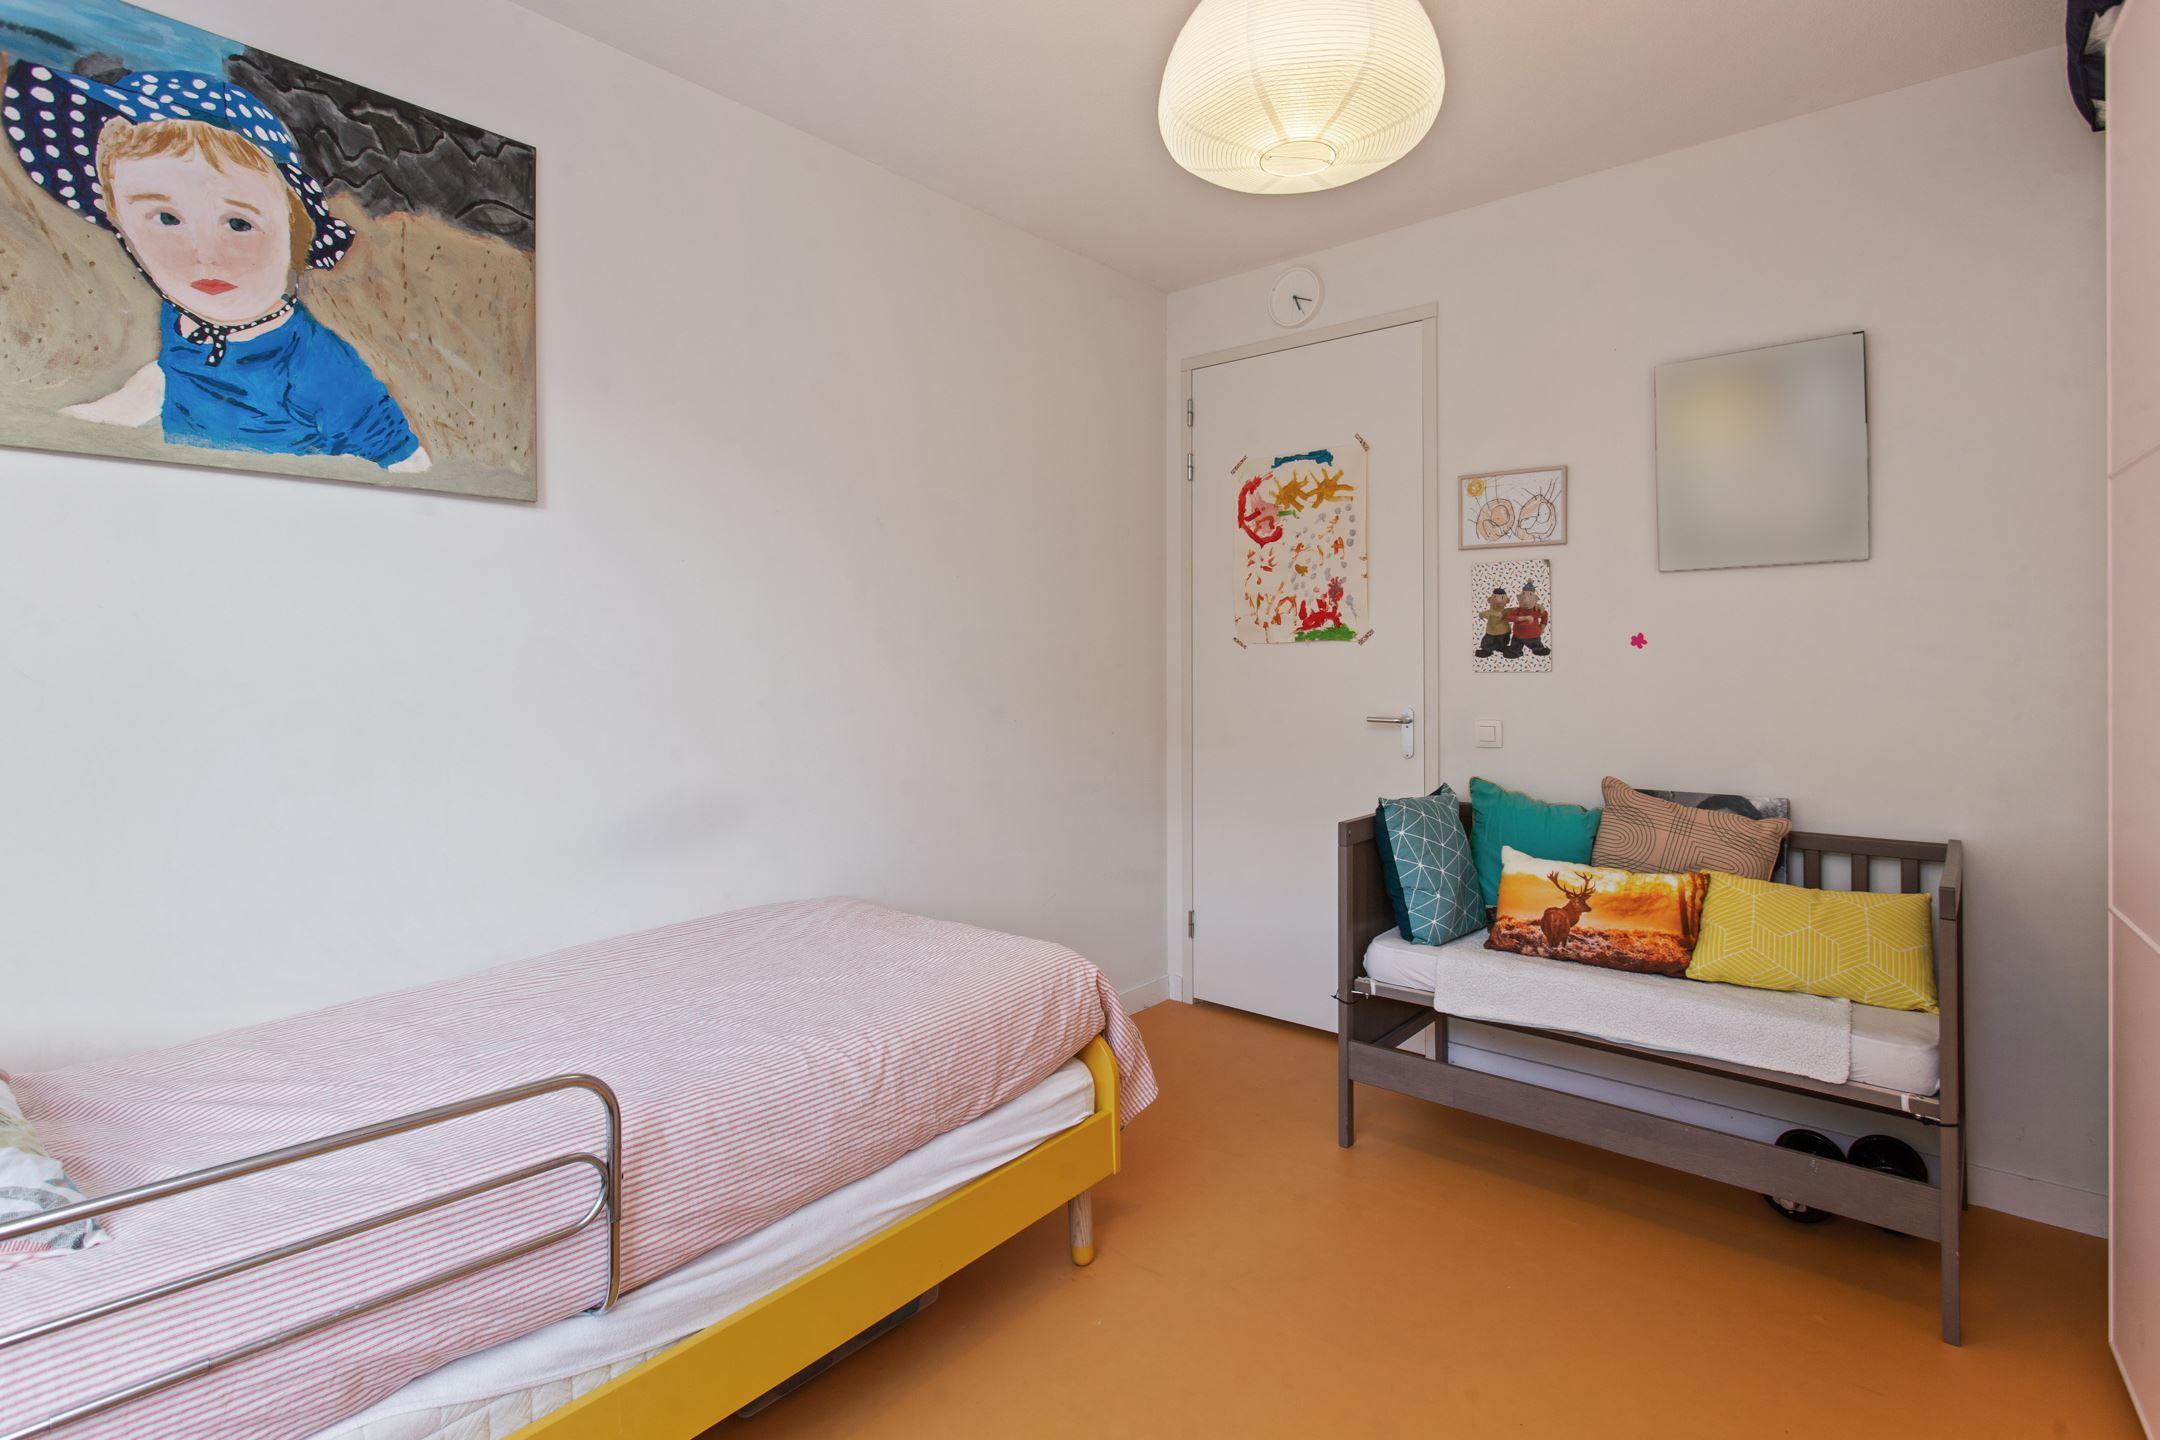 Verkocht willem beukelsstraat 15 hs 1097 cr amsterdam funda for Funda amsterdam watergraafsmeer